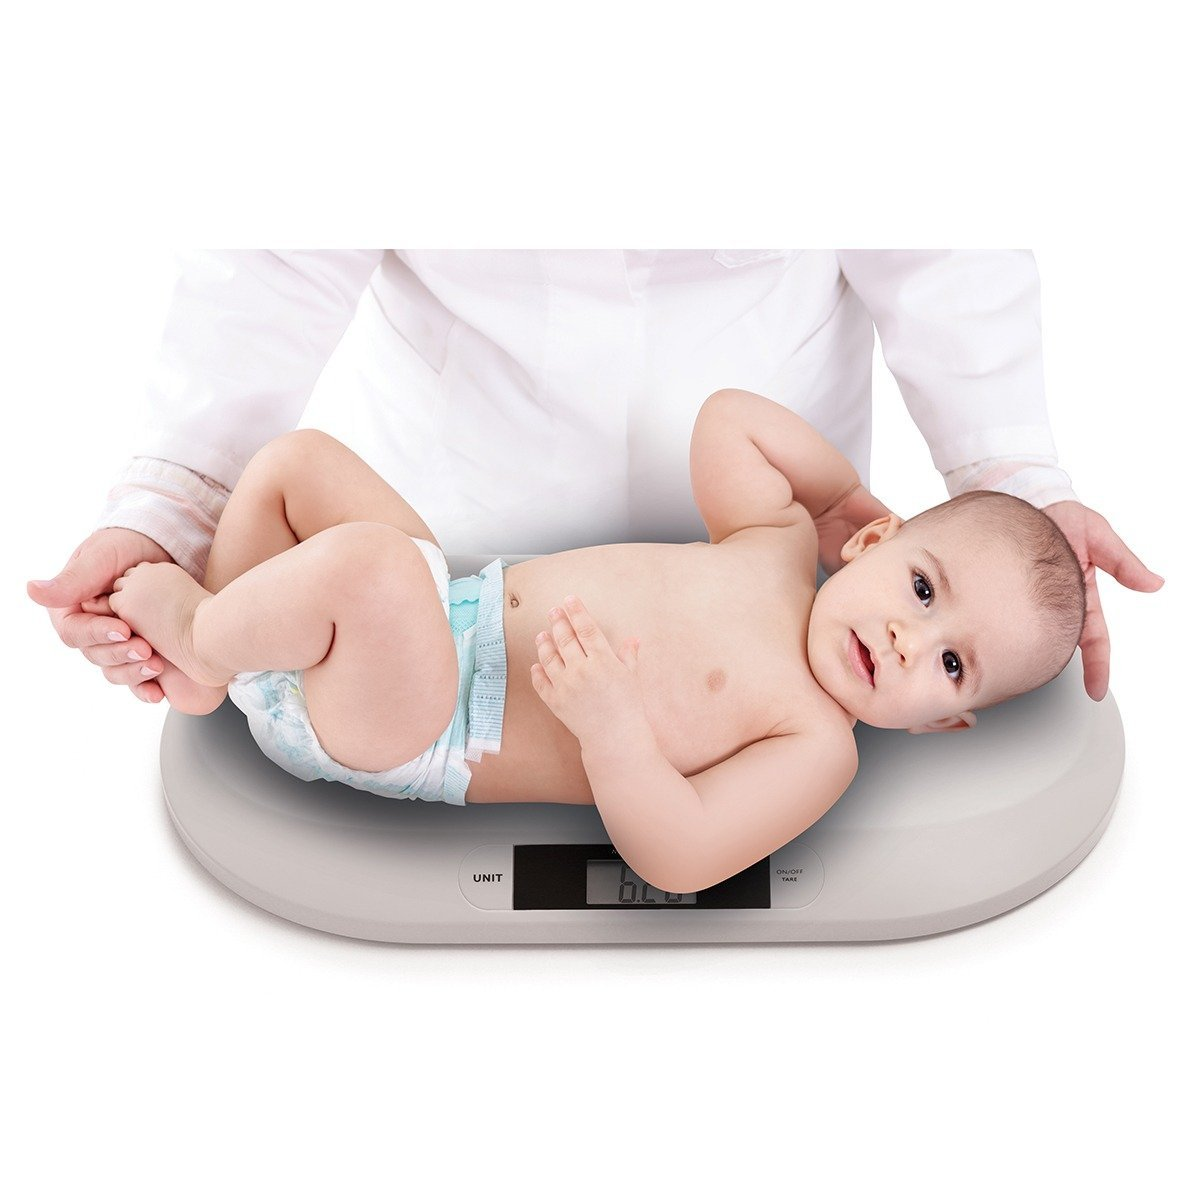 Digit�lna kojeneck� v�ha do 20 kg siv� - zv��i� obr�zok